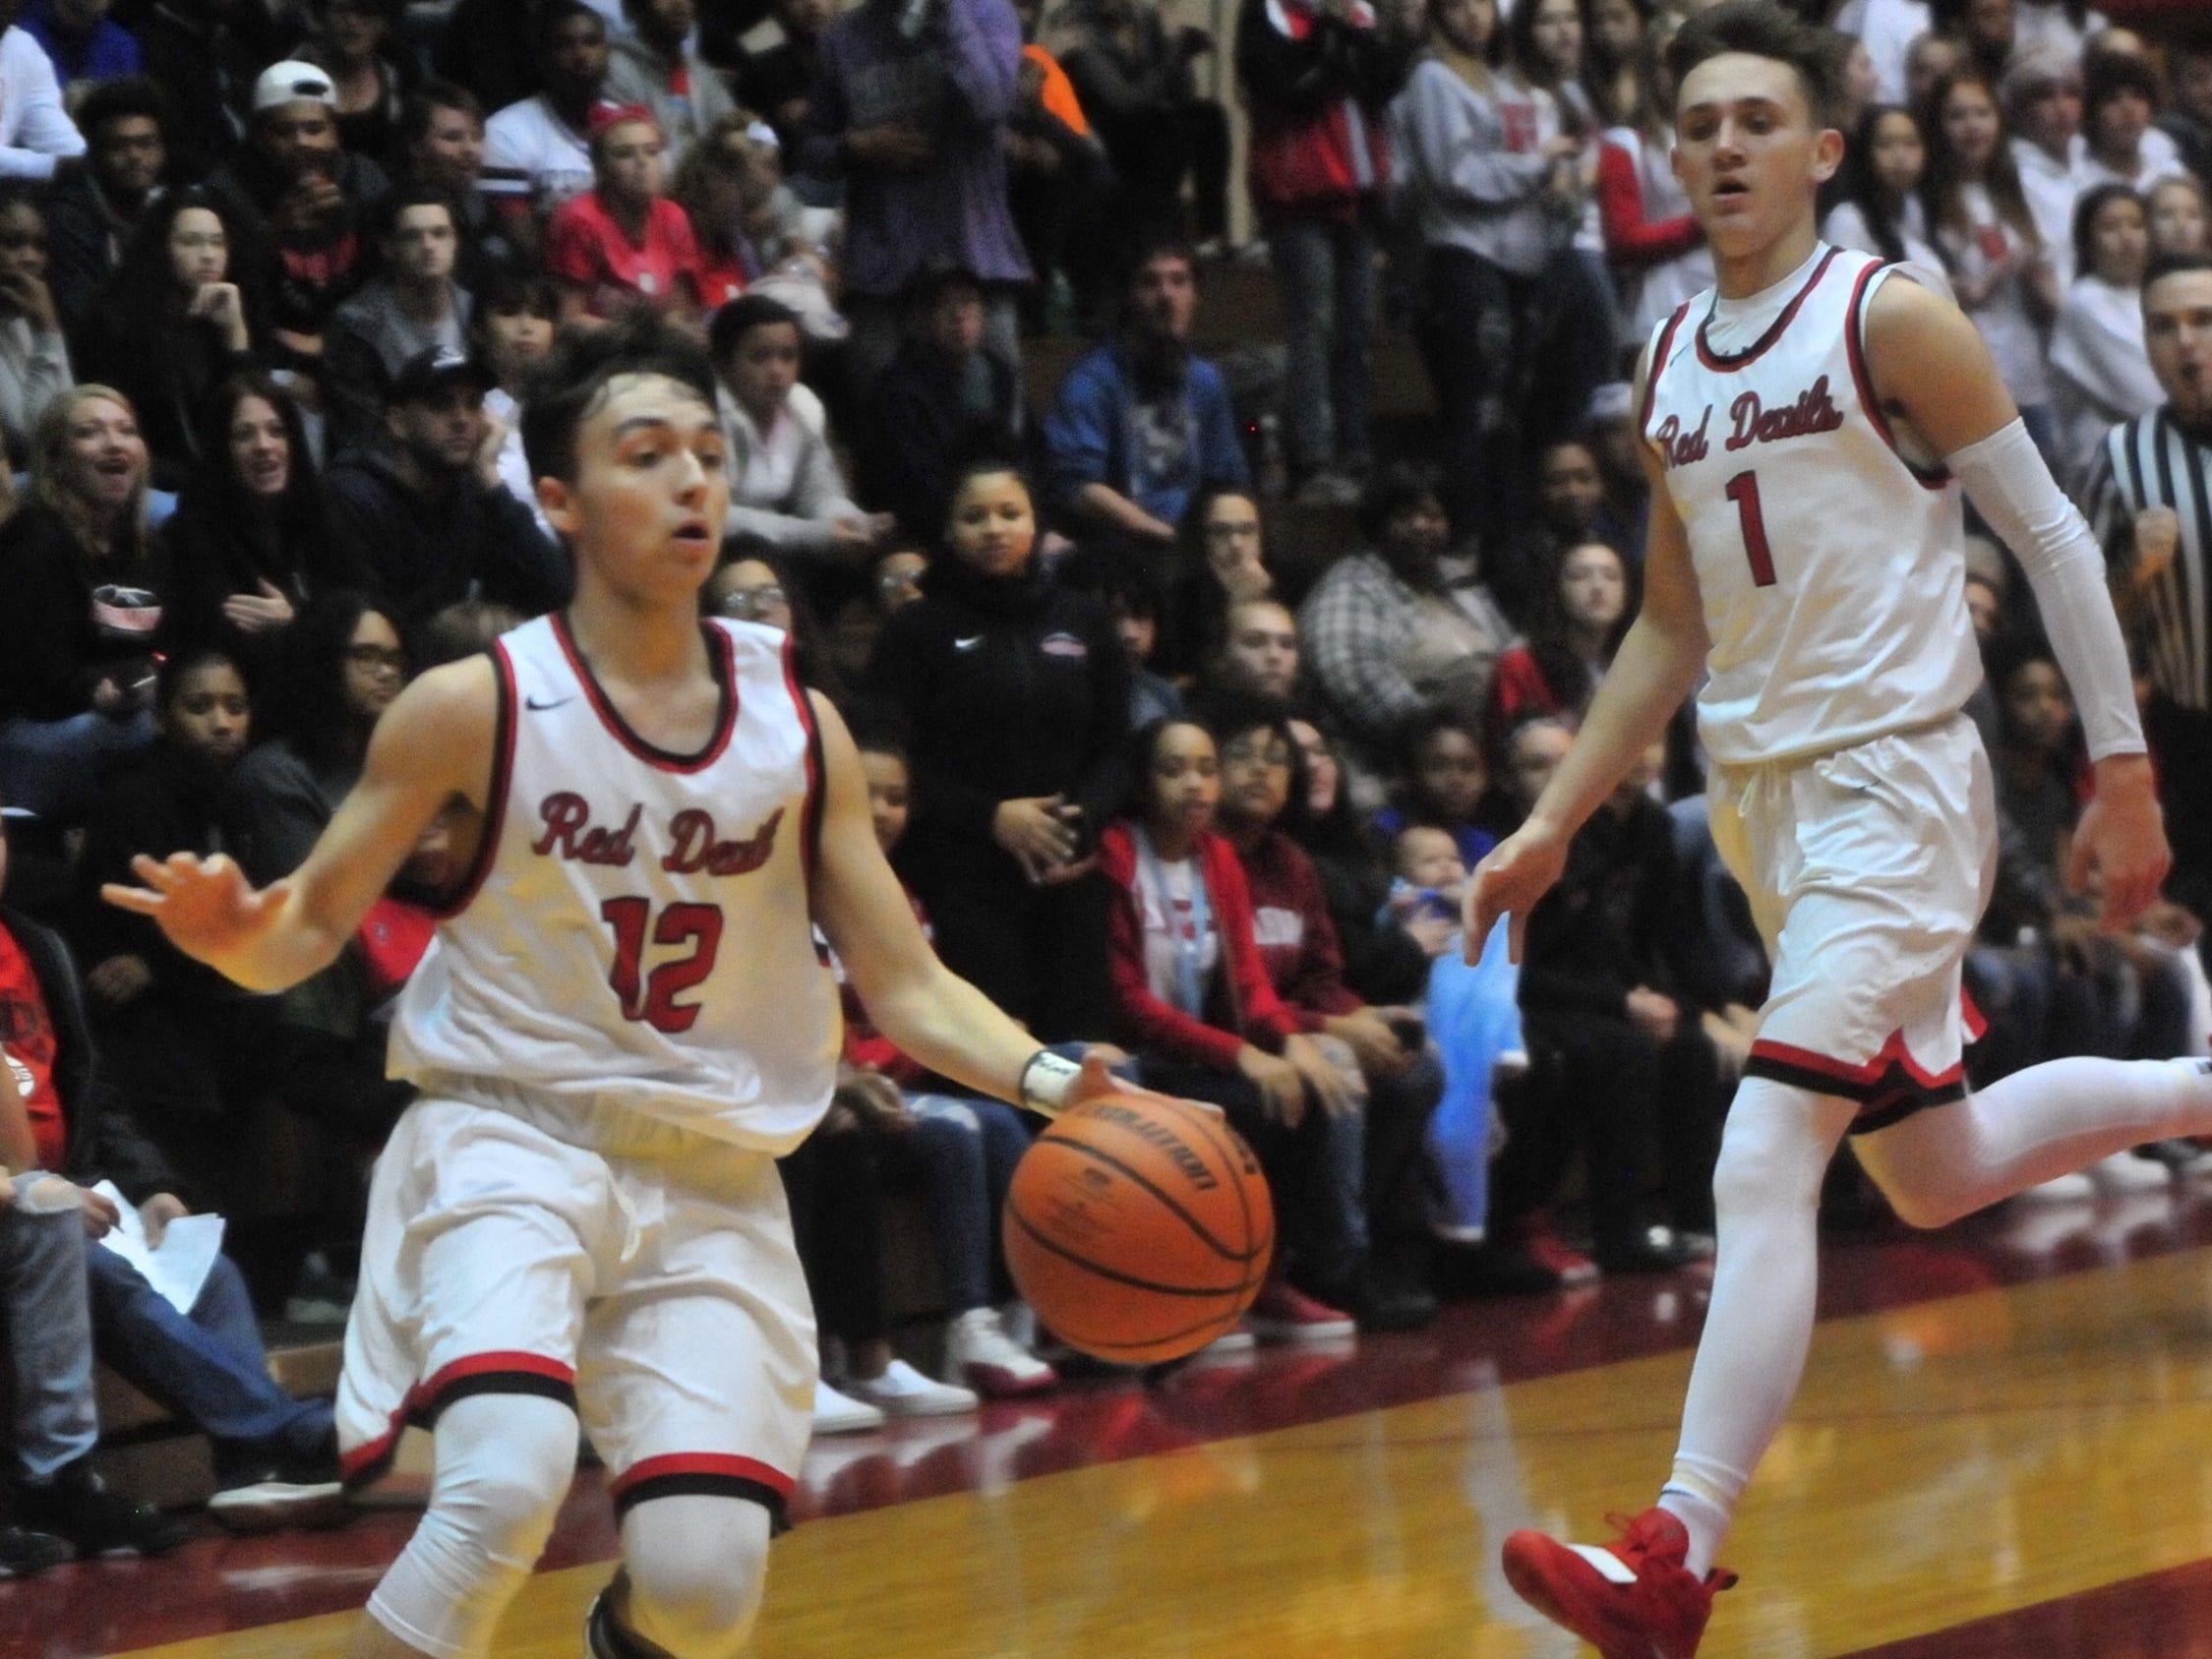 Richmond High School senior Jalen Hillard (12) move the ball  during a boys basketball game against Jay County Saturday, Nov. 24, 2018 at Richmond High School's Tiernan Center.